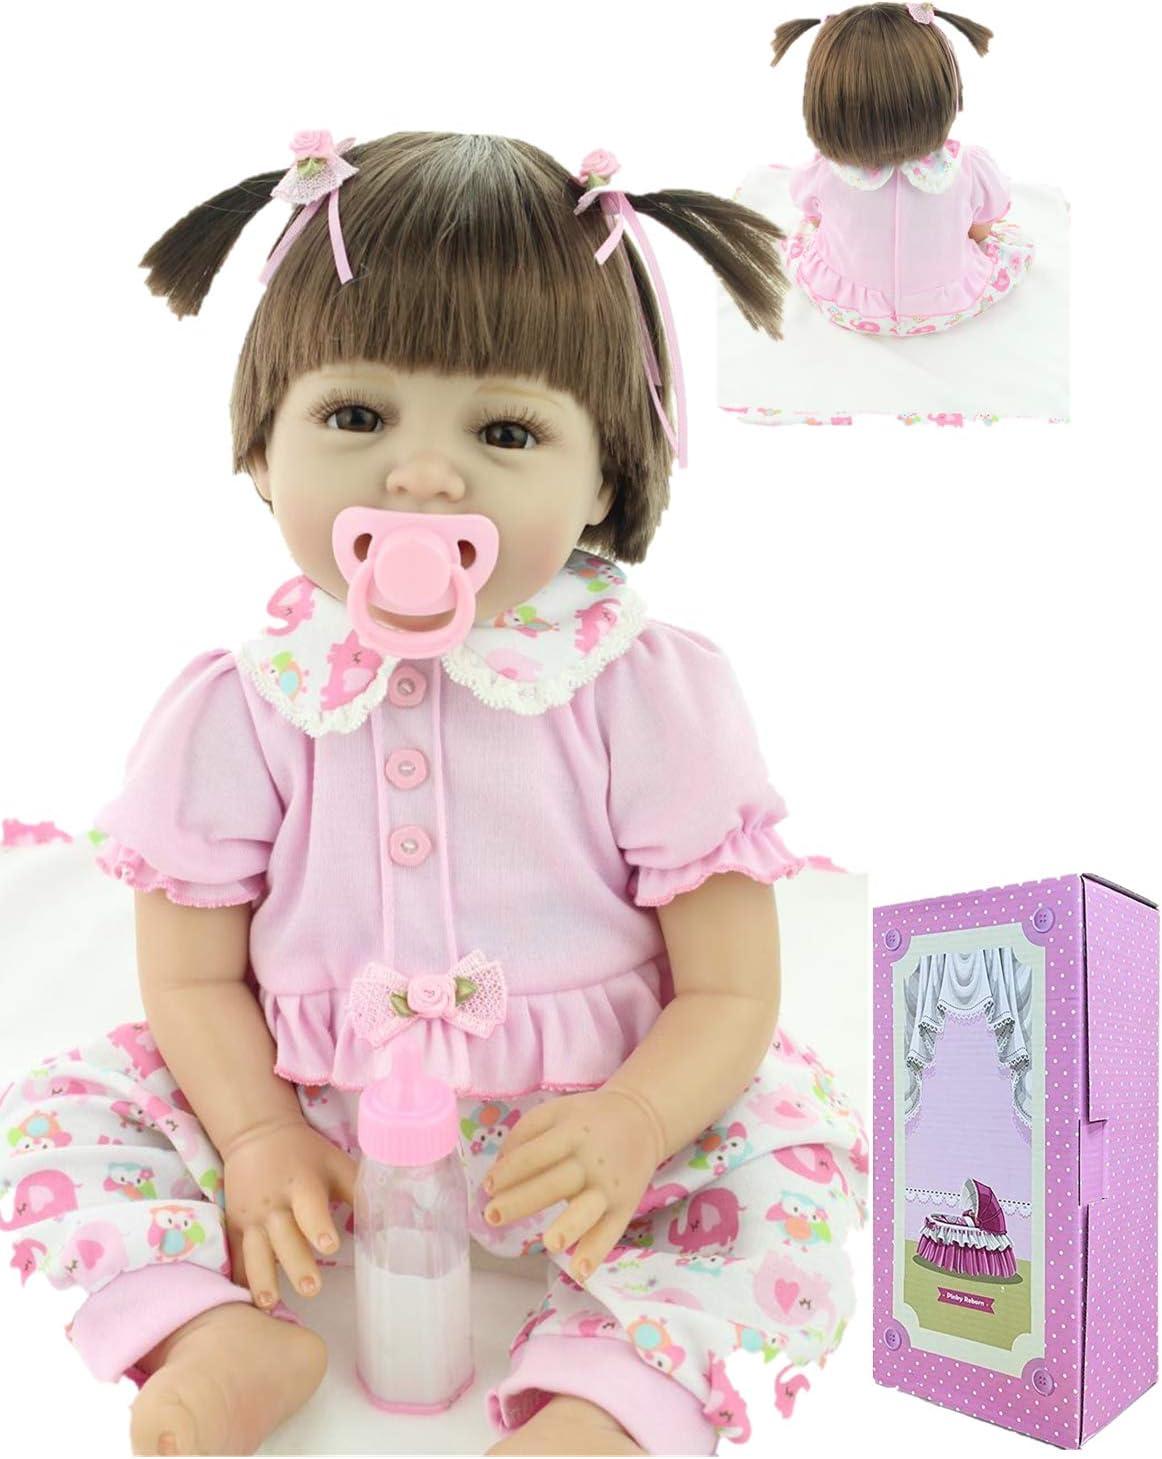 Reborn Baby Limited price Seattle Mall Girls Dolls Realistic Silicone Inc 22 Lifelike Vinyl